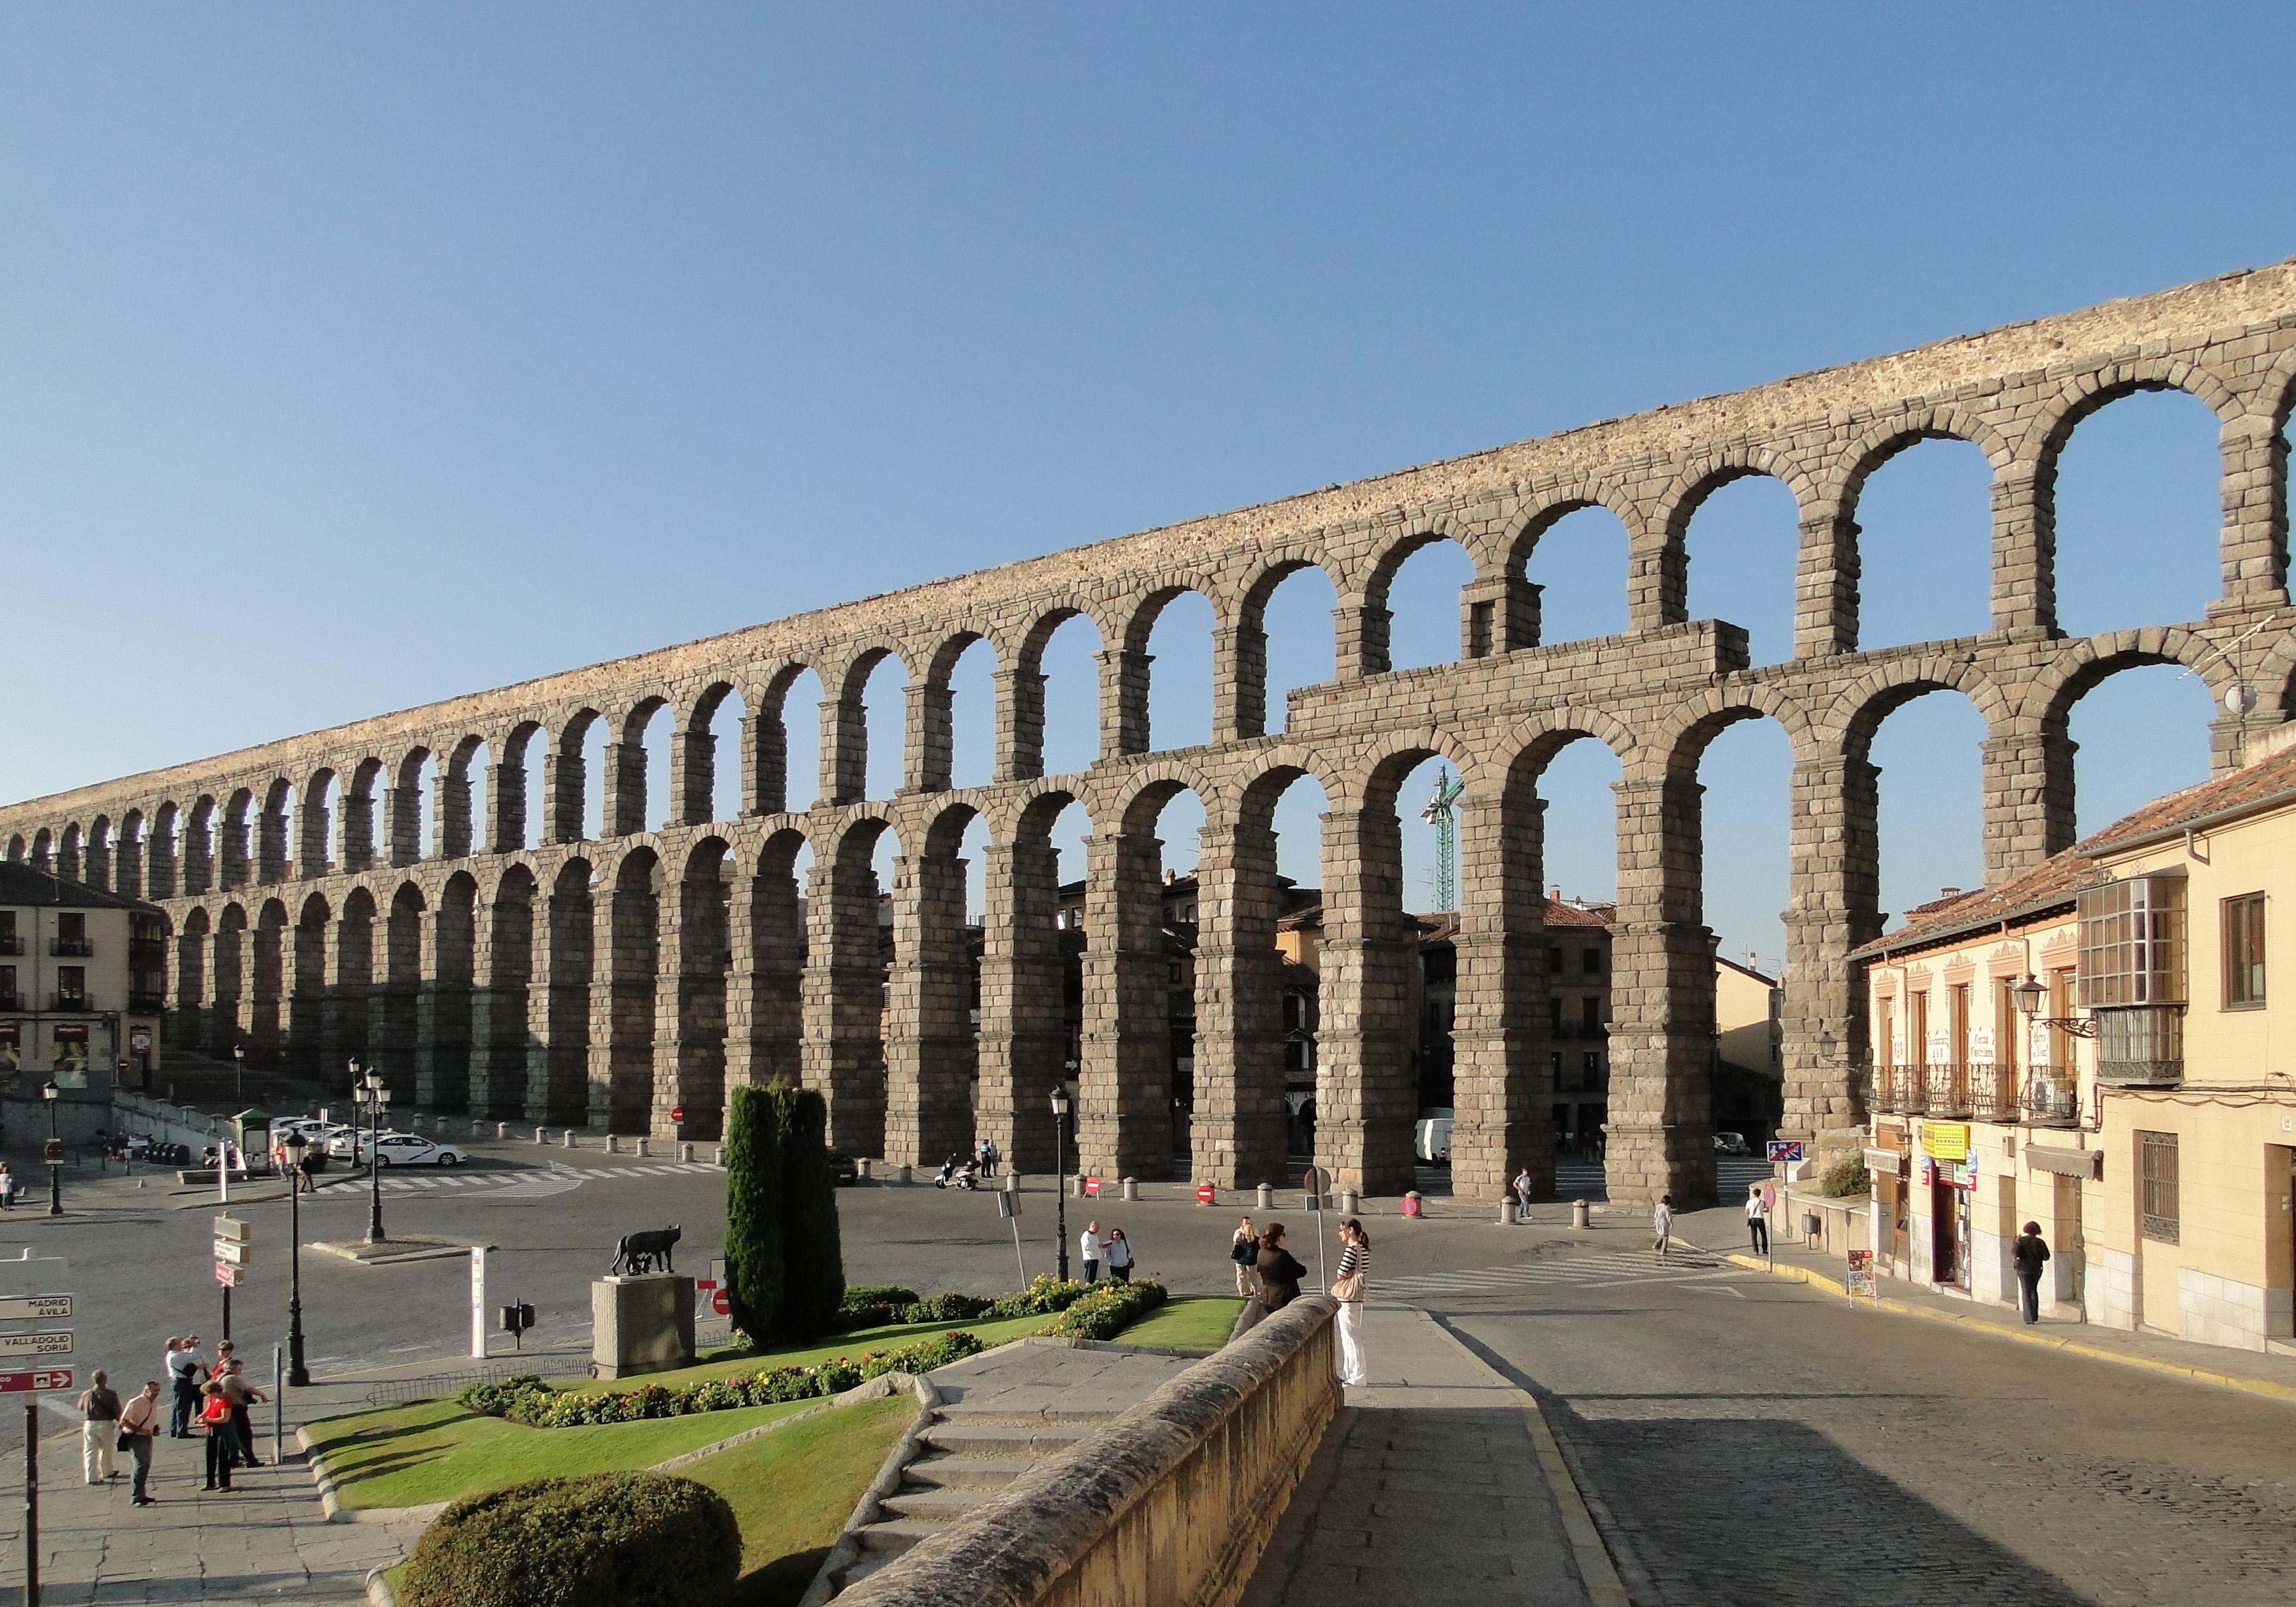 Acueducto de Segovia. B Gagnon